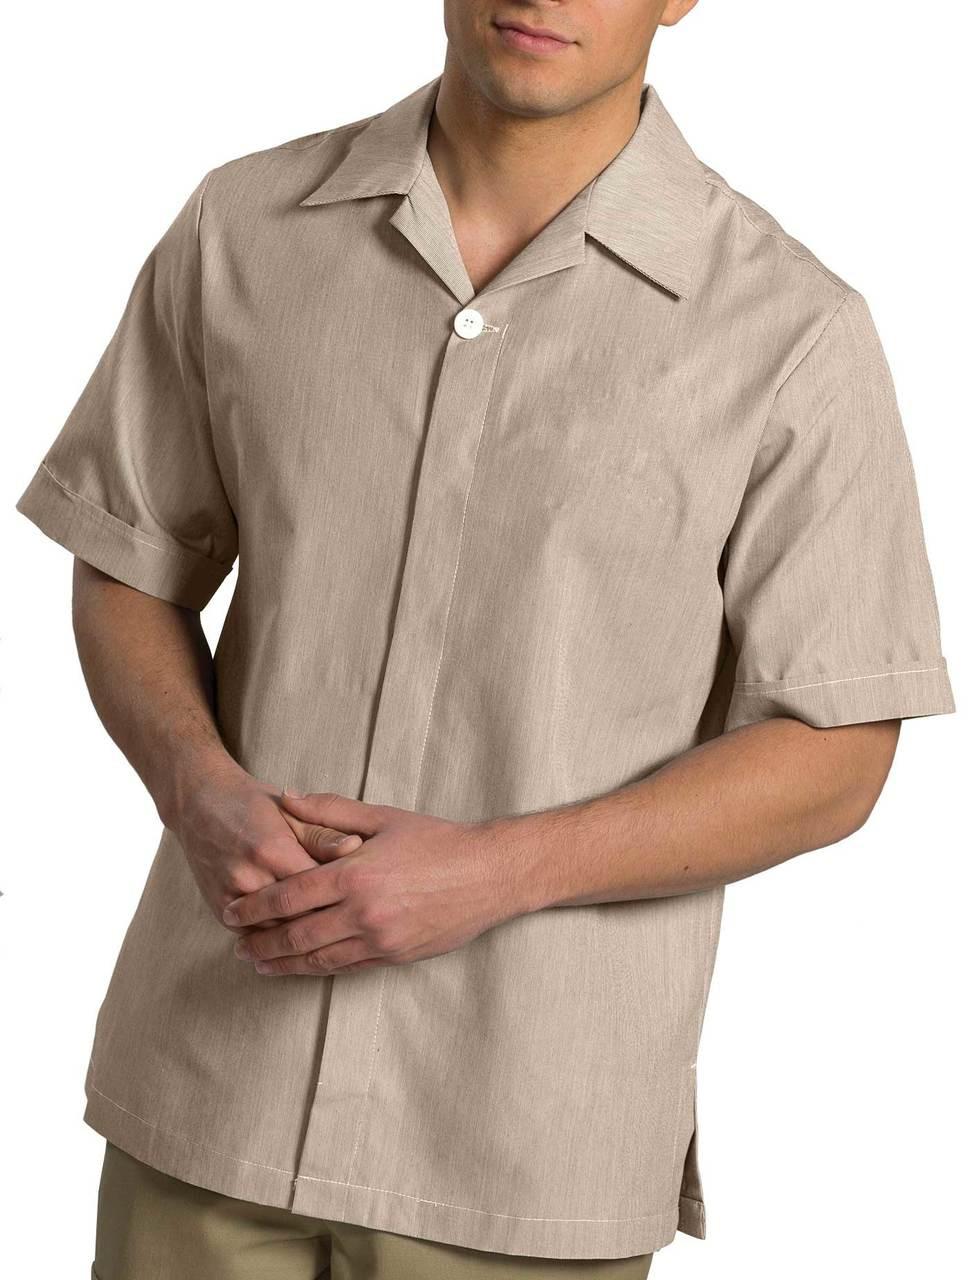 Men's Hidden Placket Tunic CLOSEOUT No Returns